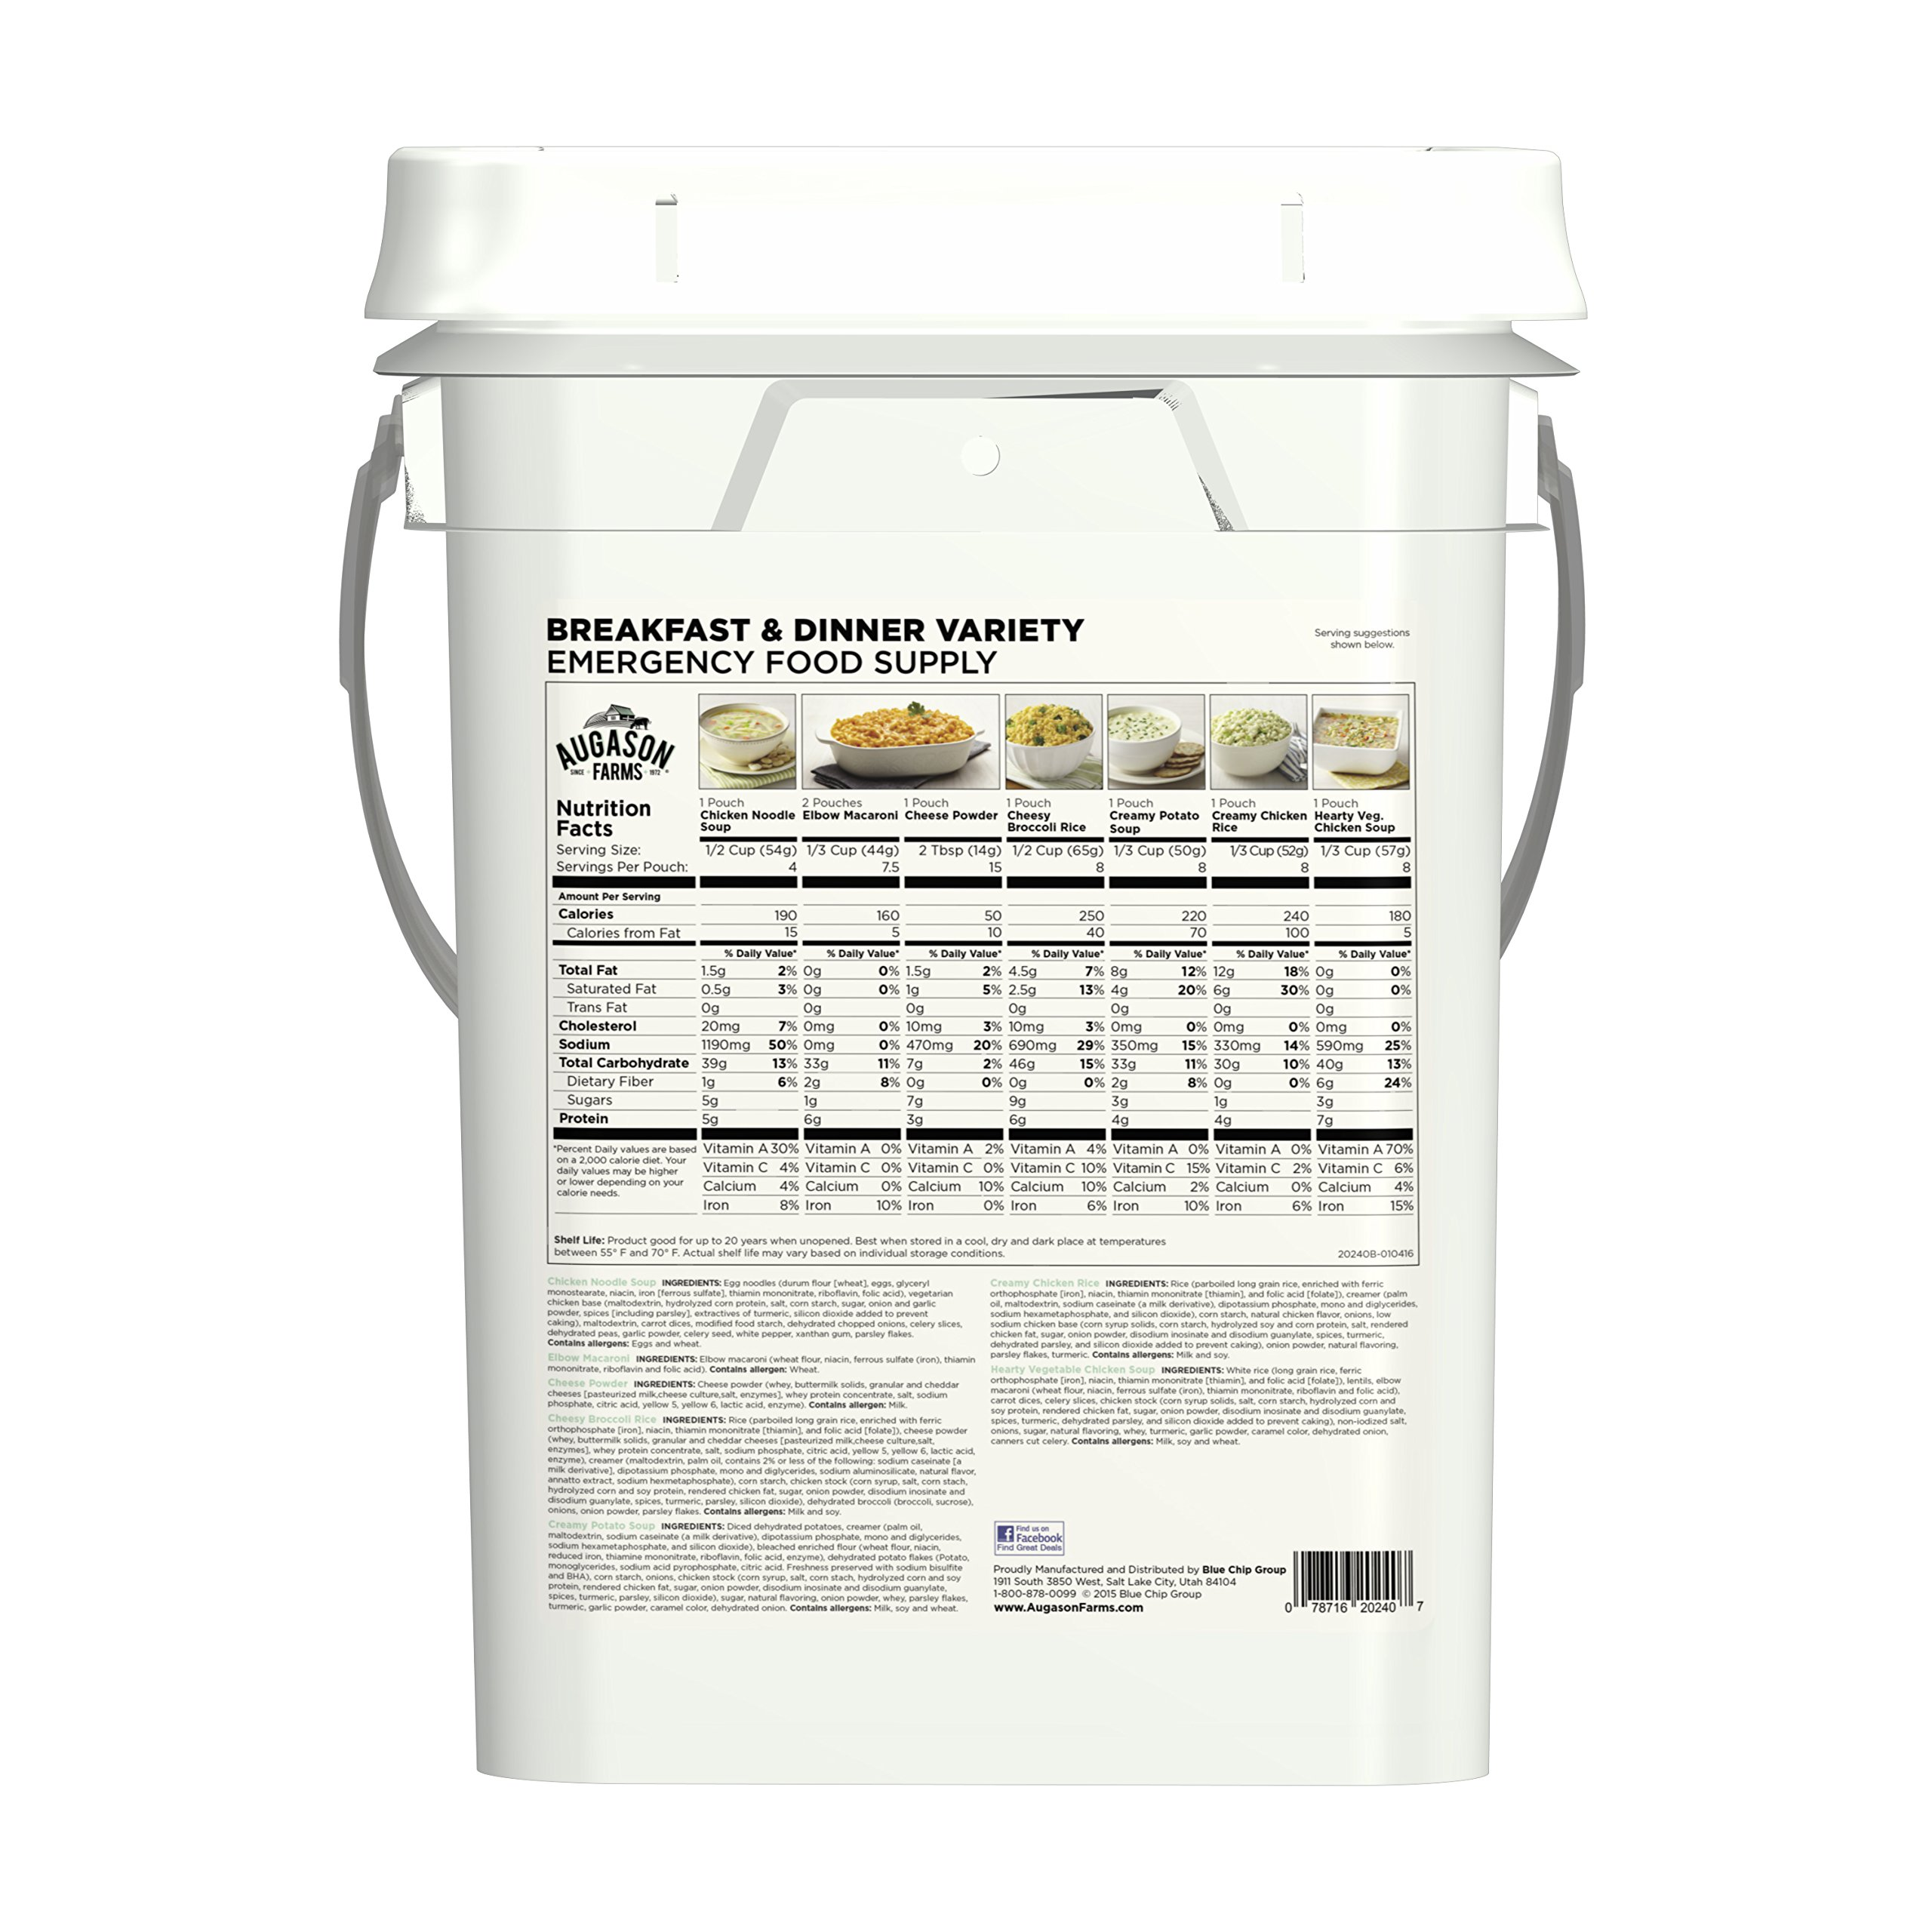 Augason Farms Breakfast & Dinner Variety Emergency Food Supply 7 lbs 5.21 oz 4 Gallon Pail by Augason Farms (Image #2)